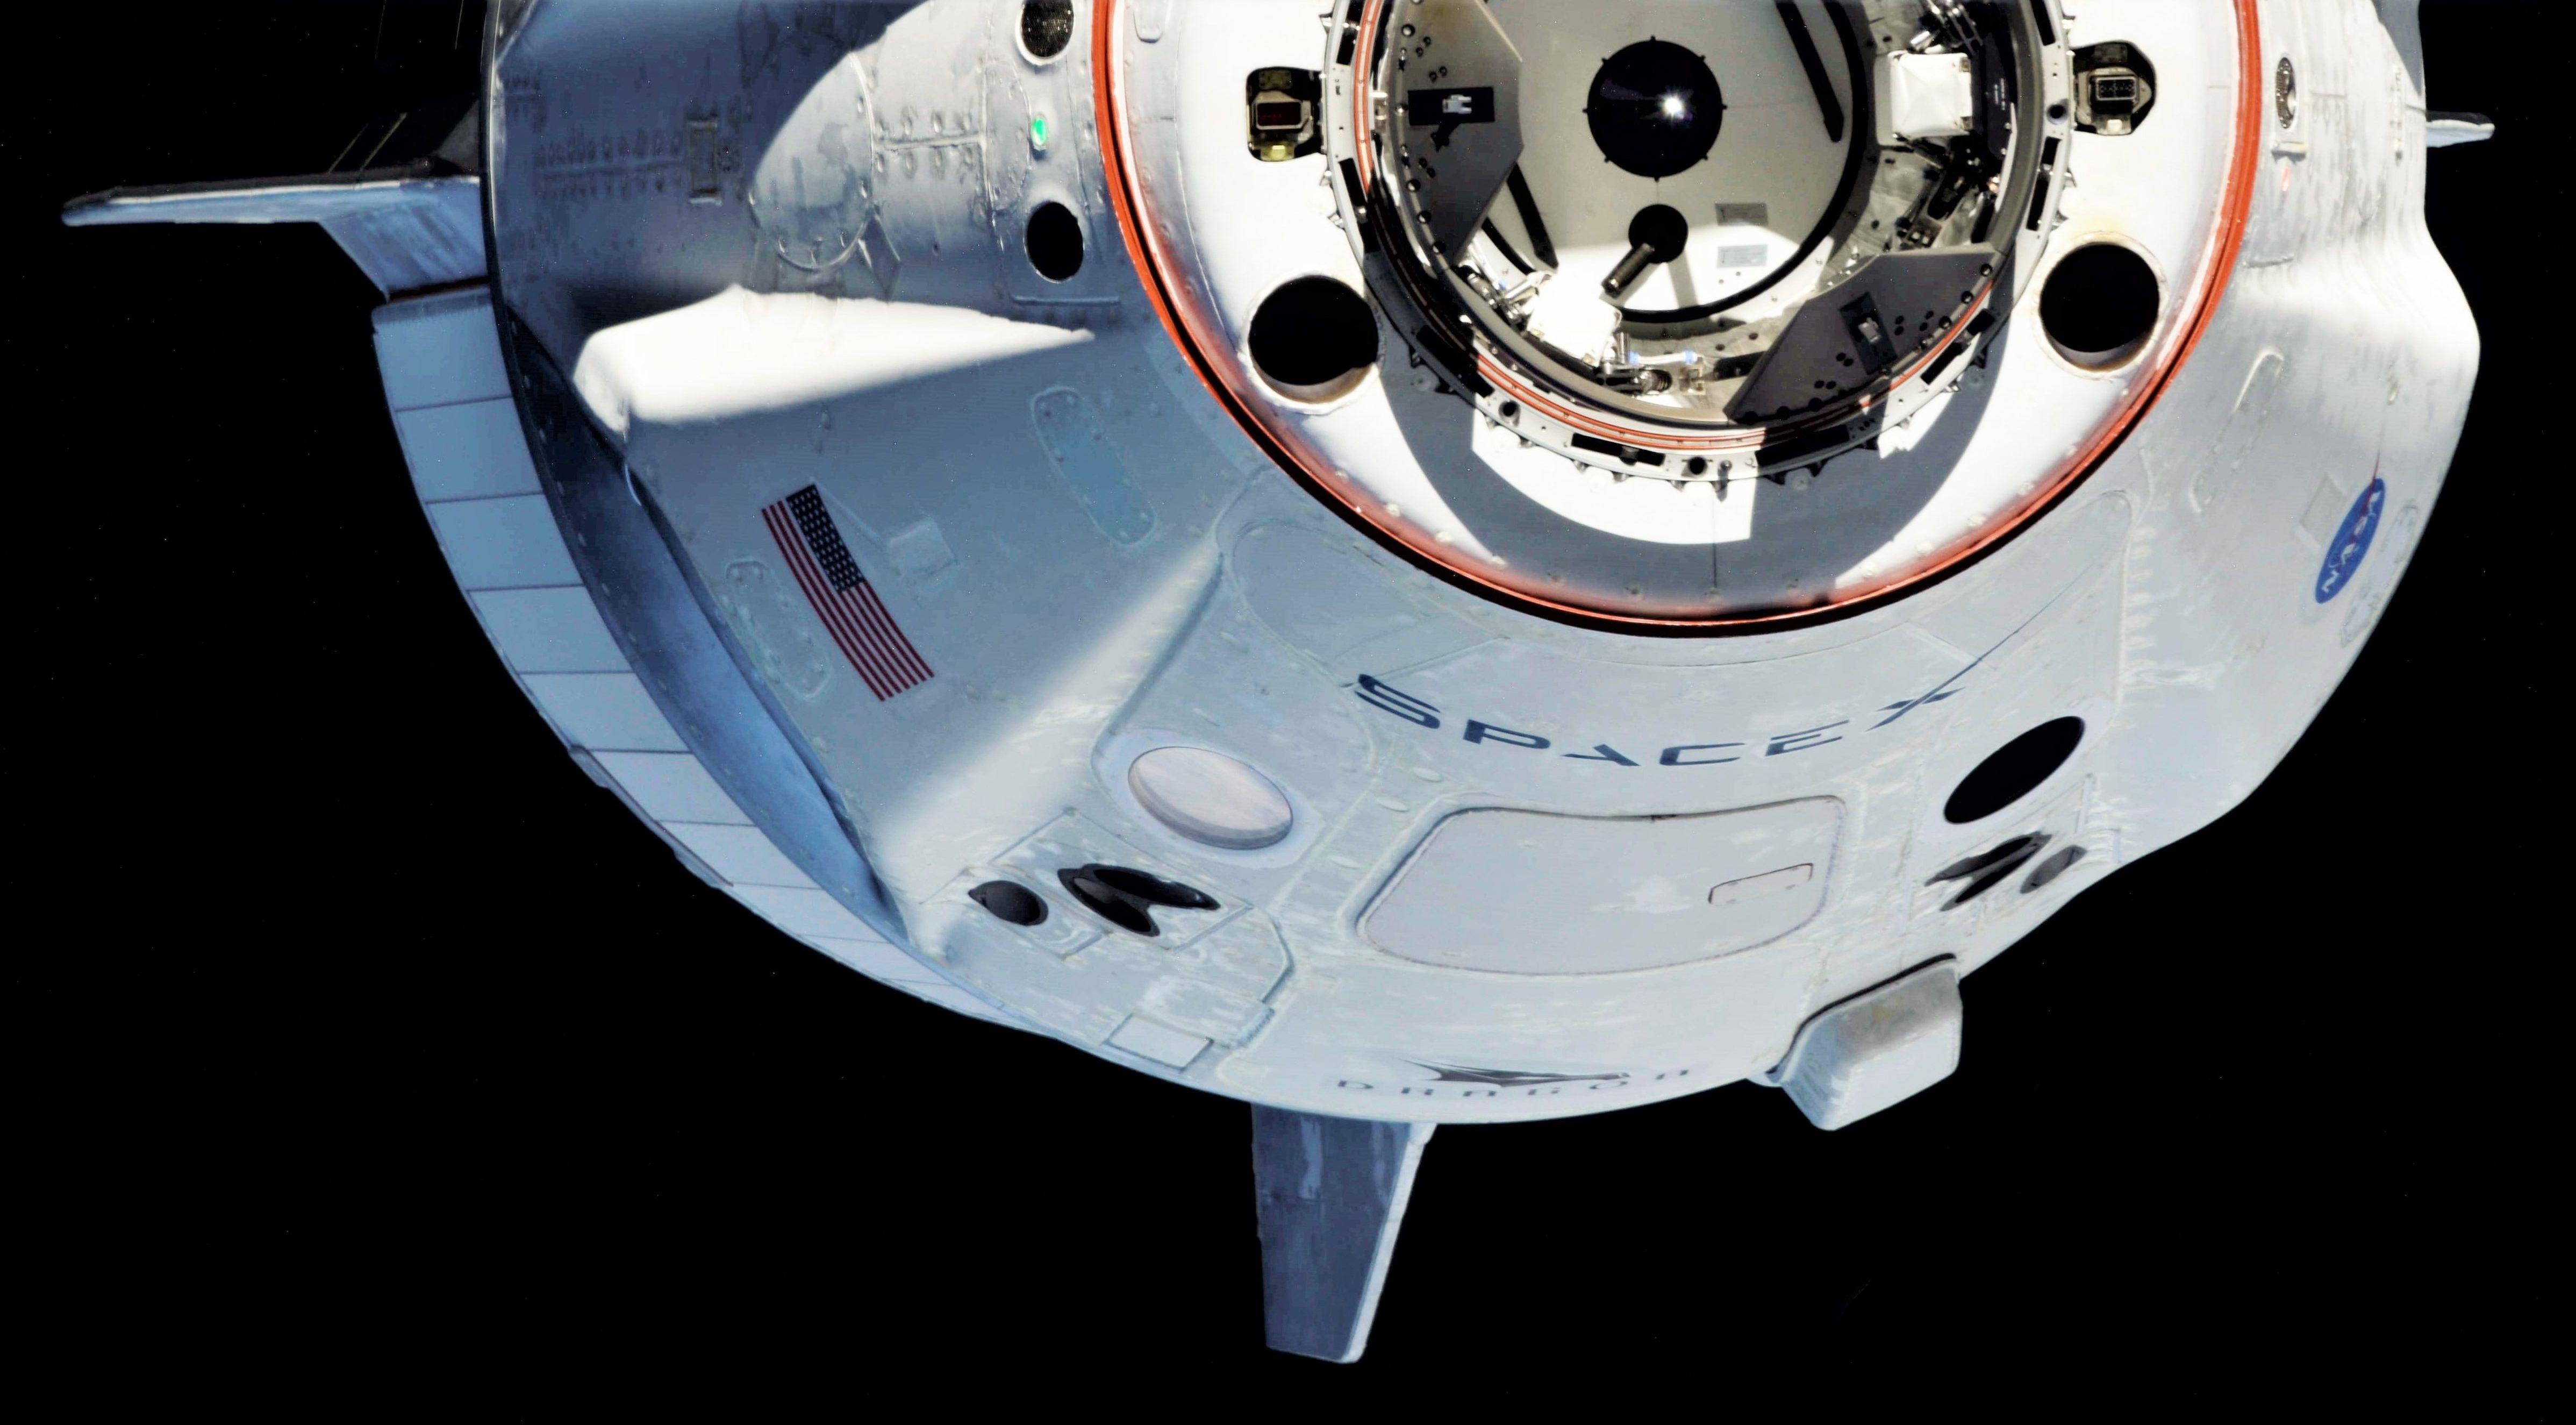 Crew Dragon DM-1 ISS arrival 030319 (Oleg Kononenko) 2 edit 4